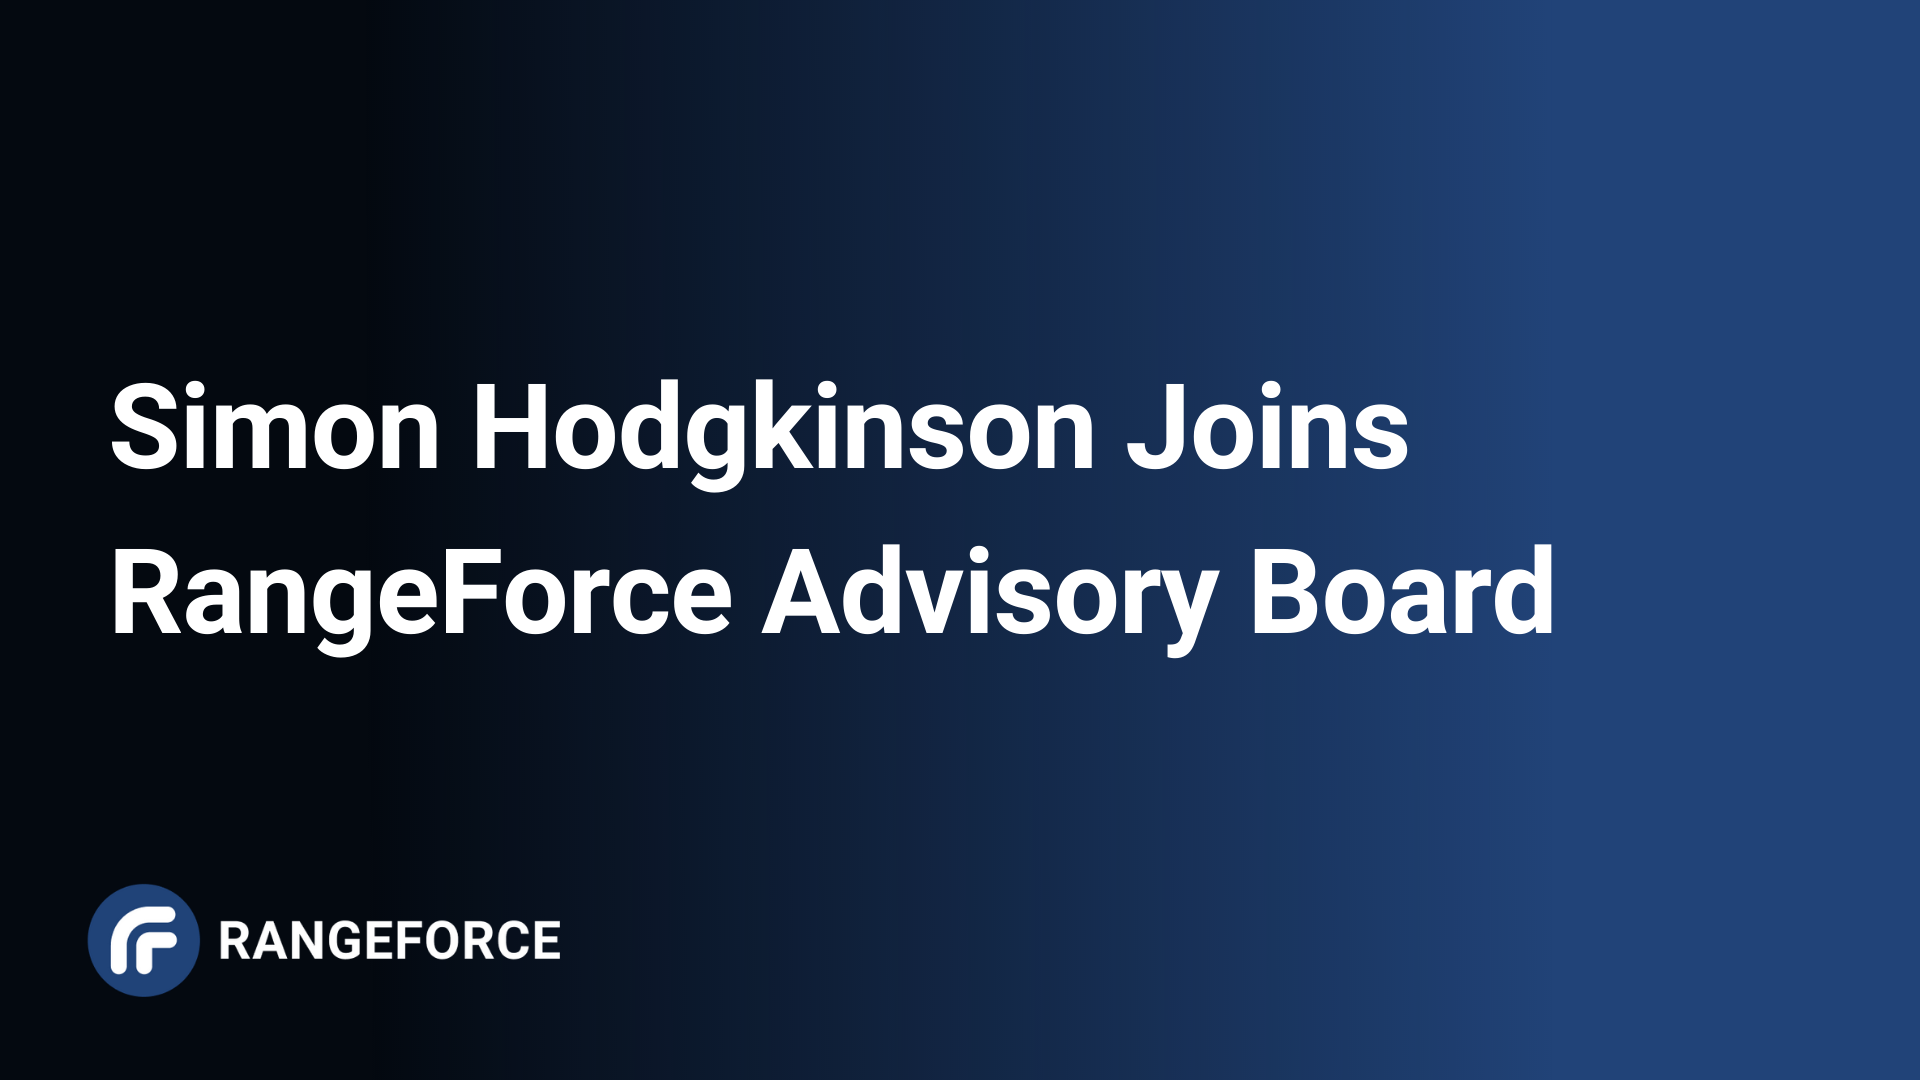 Former bp CISO Simon Hodgkinson Joins RangeForce Advisory Board